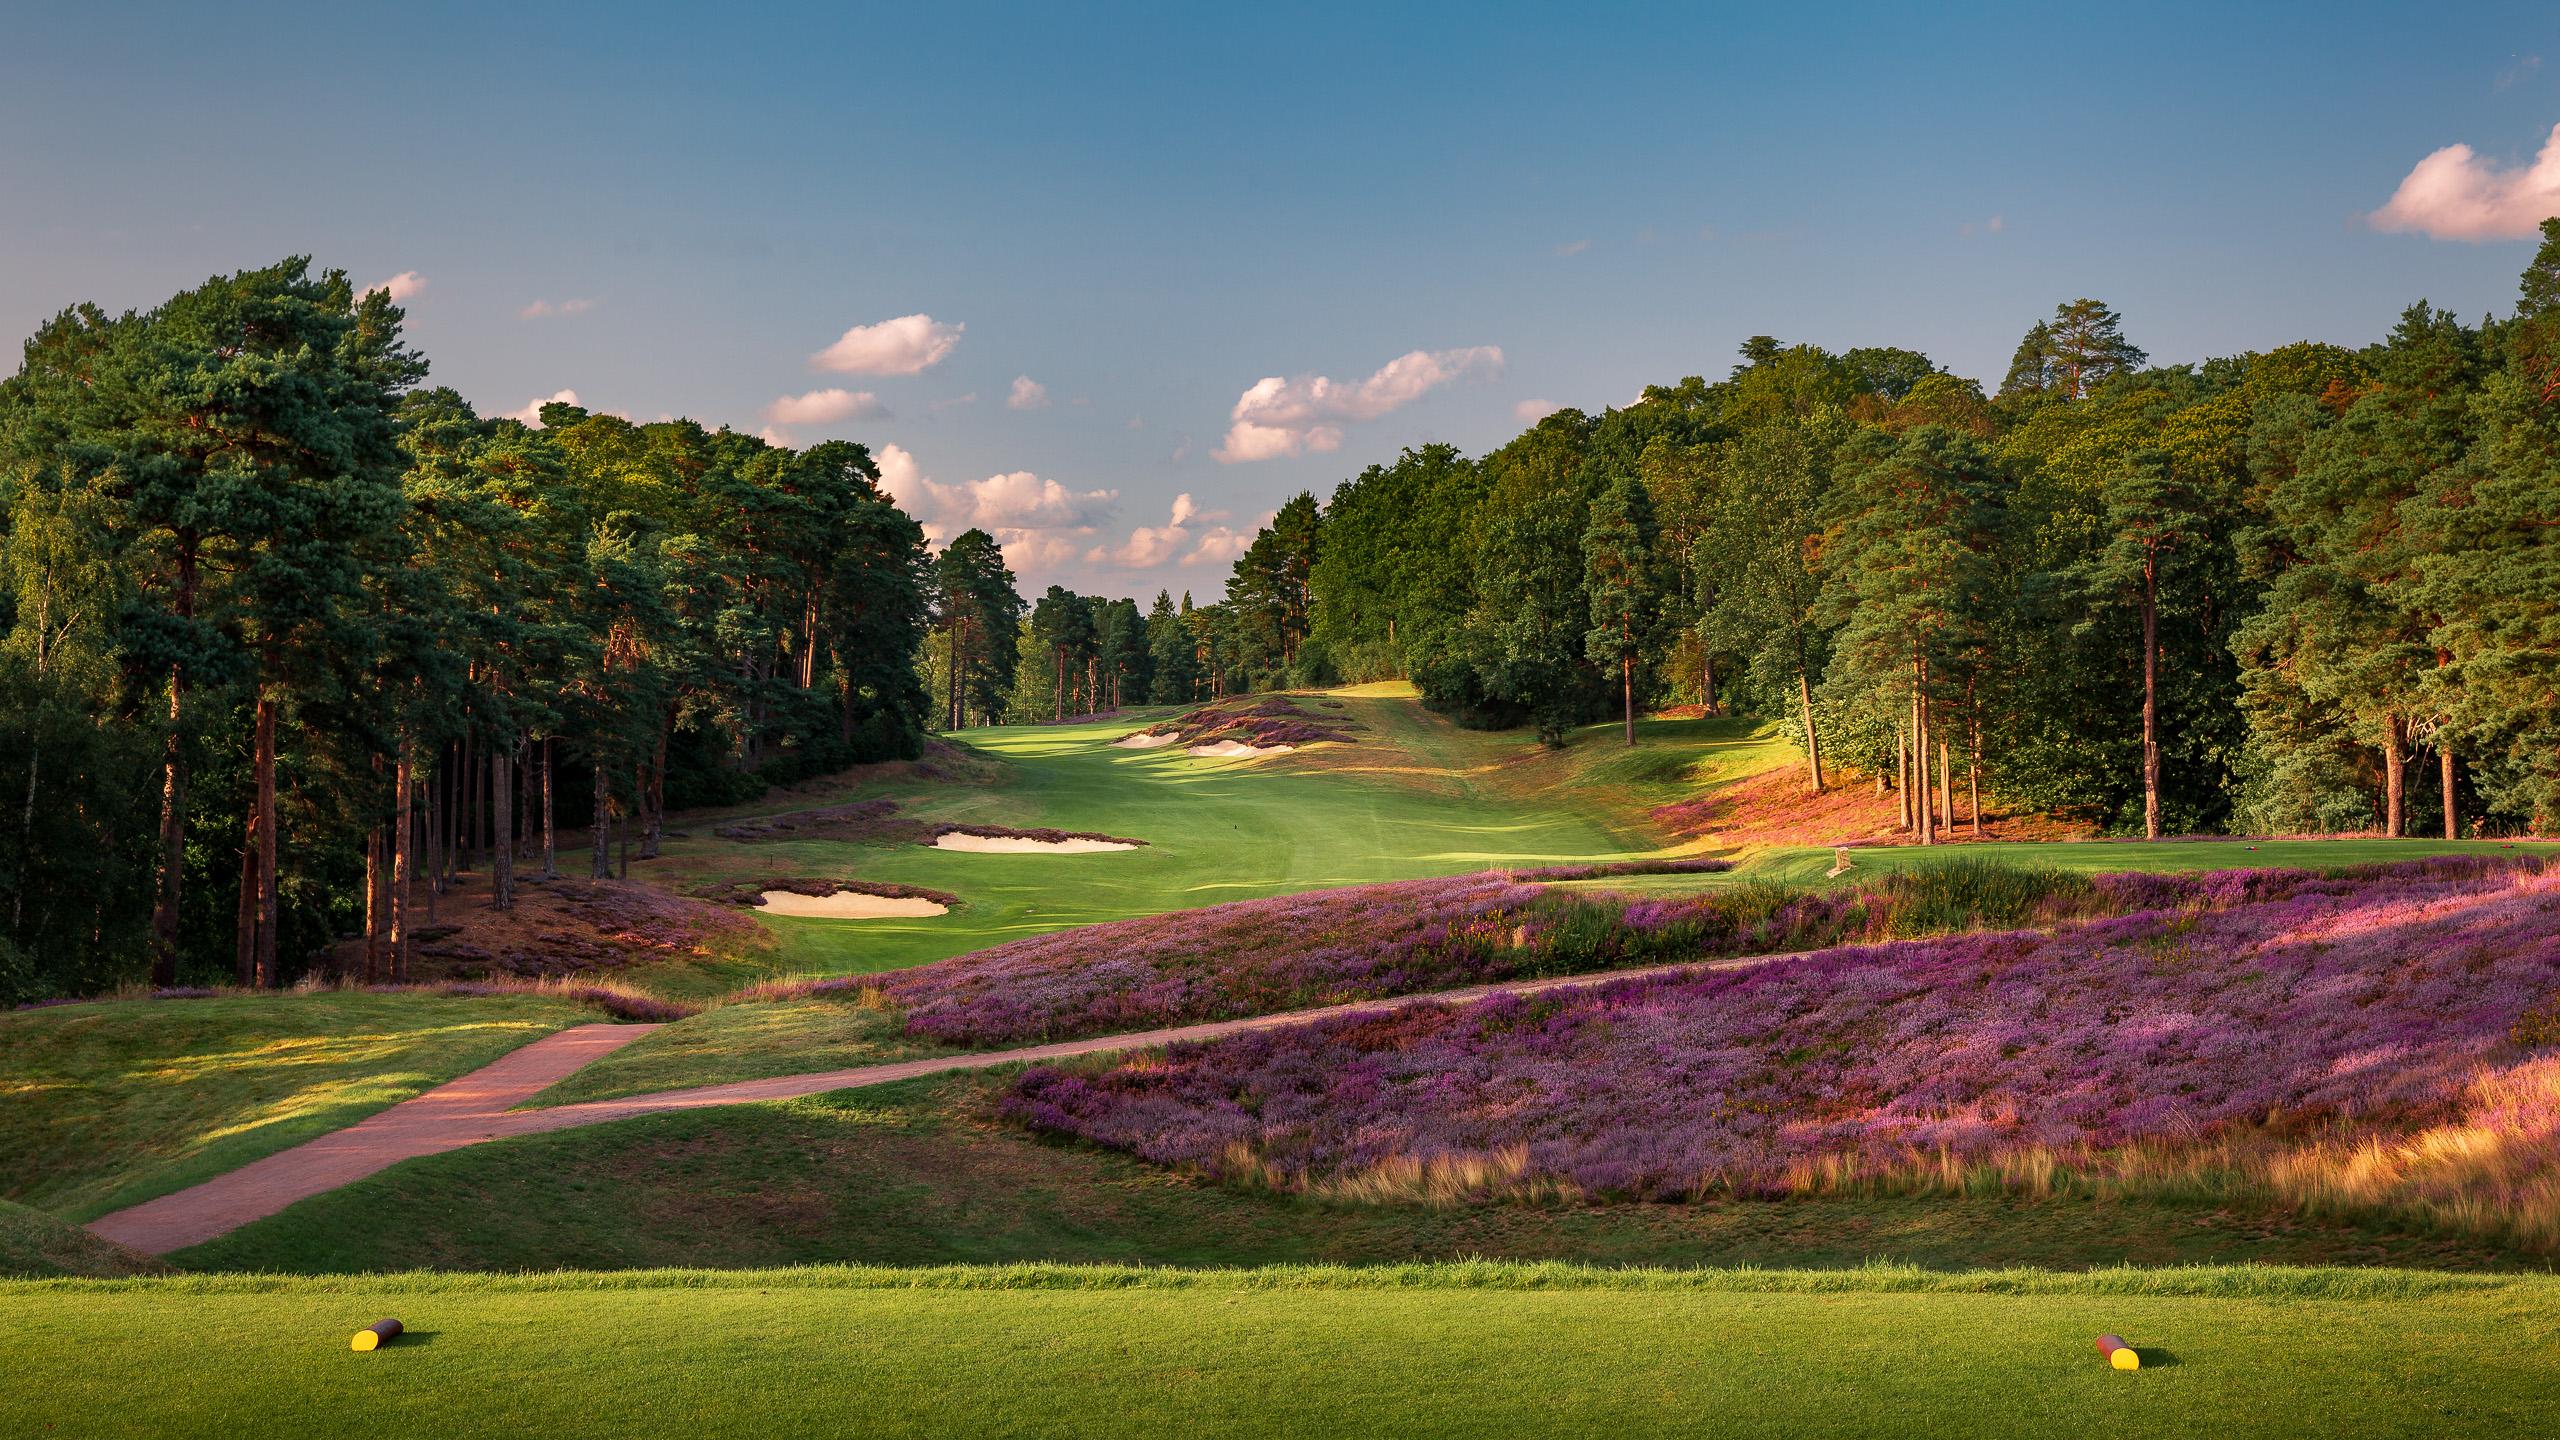 01st-Hole-St-Georges-Hill-Golf-Club-2276-Edit-2